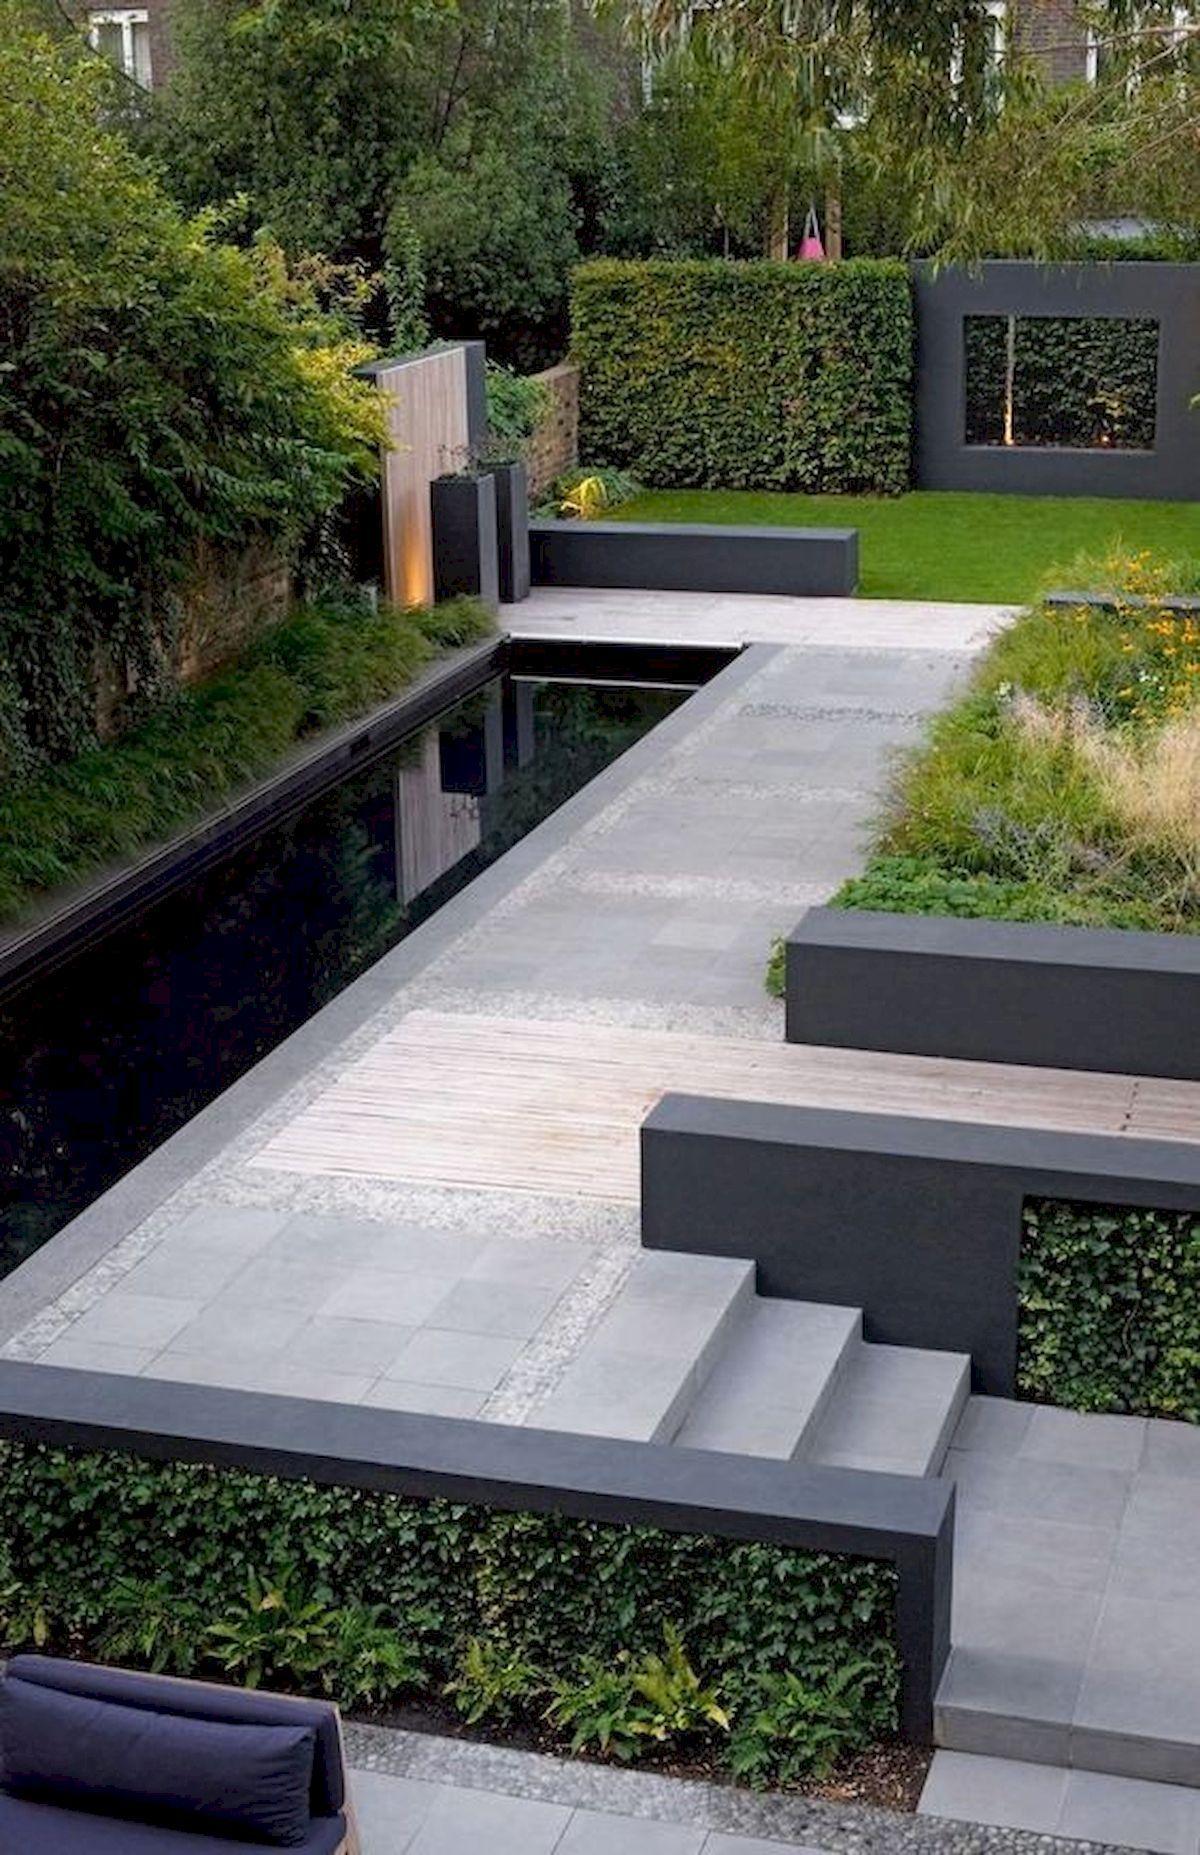 60 Beautiful Backyard Garden Design Ideas And Remodel (54 #patioandgardenideas